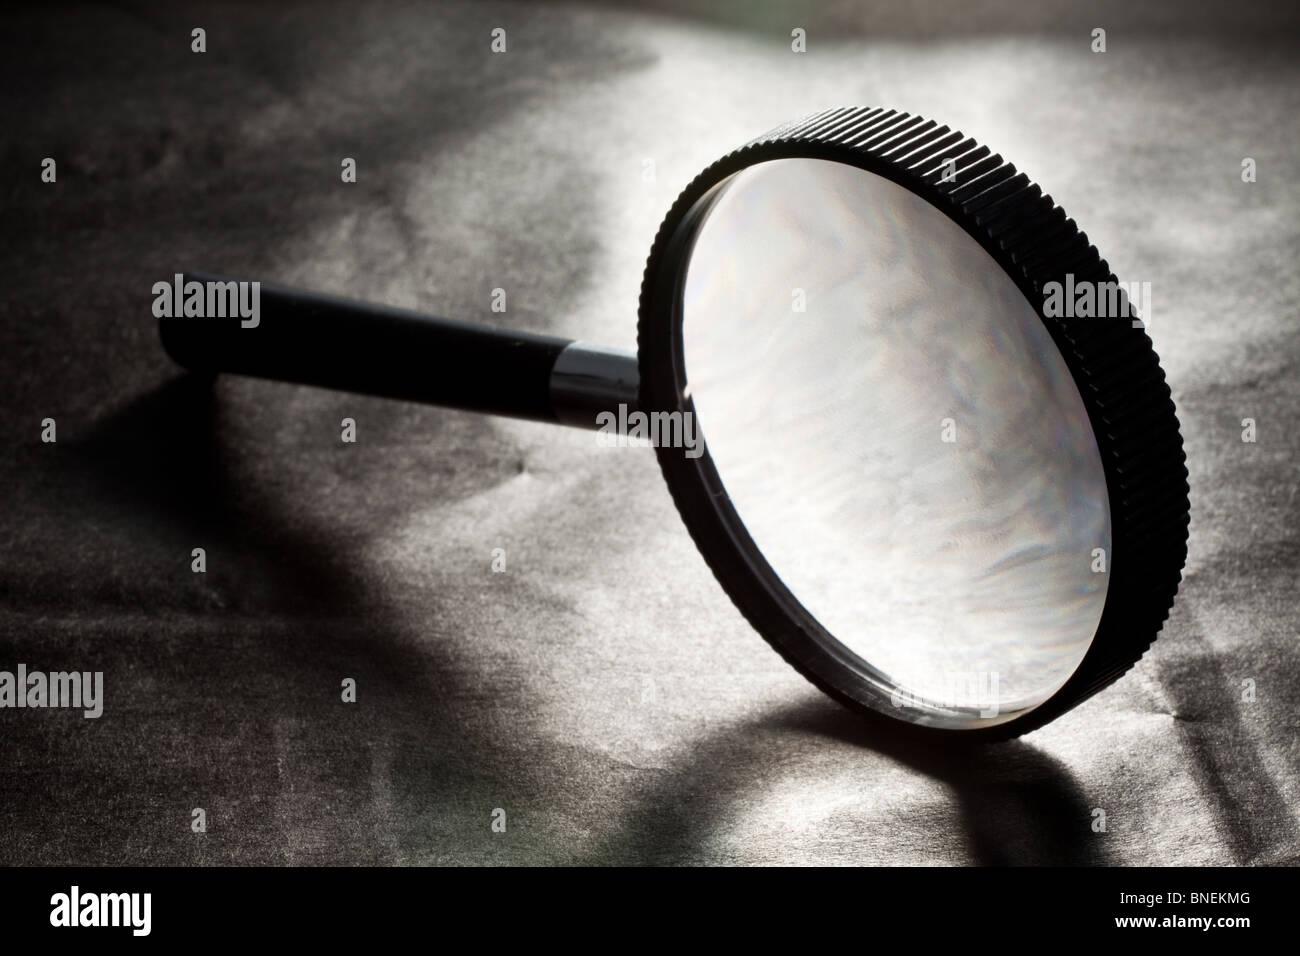 Lupa sobre fondo negro Imagen De Stock